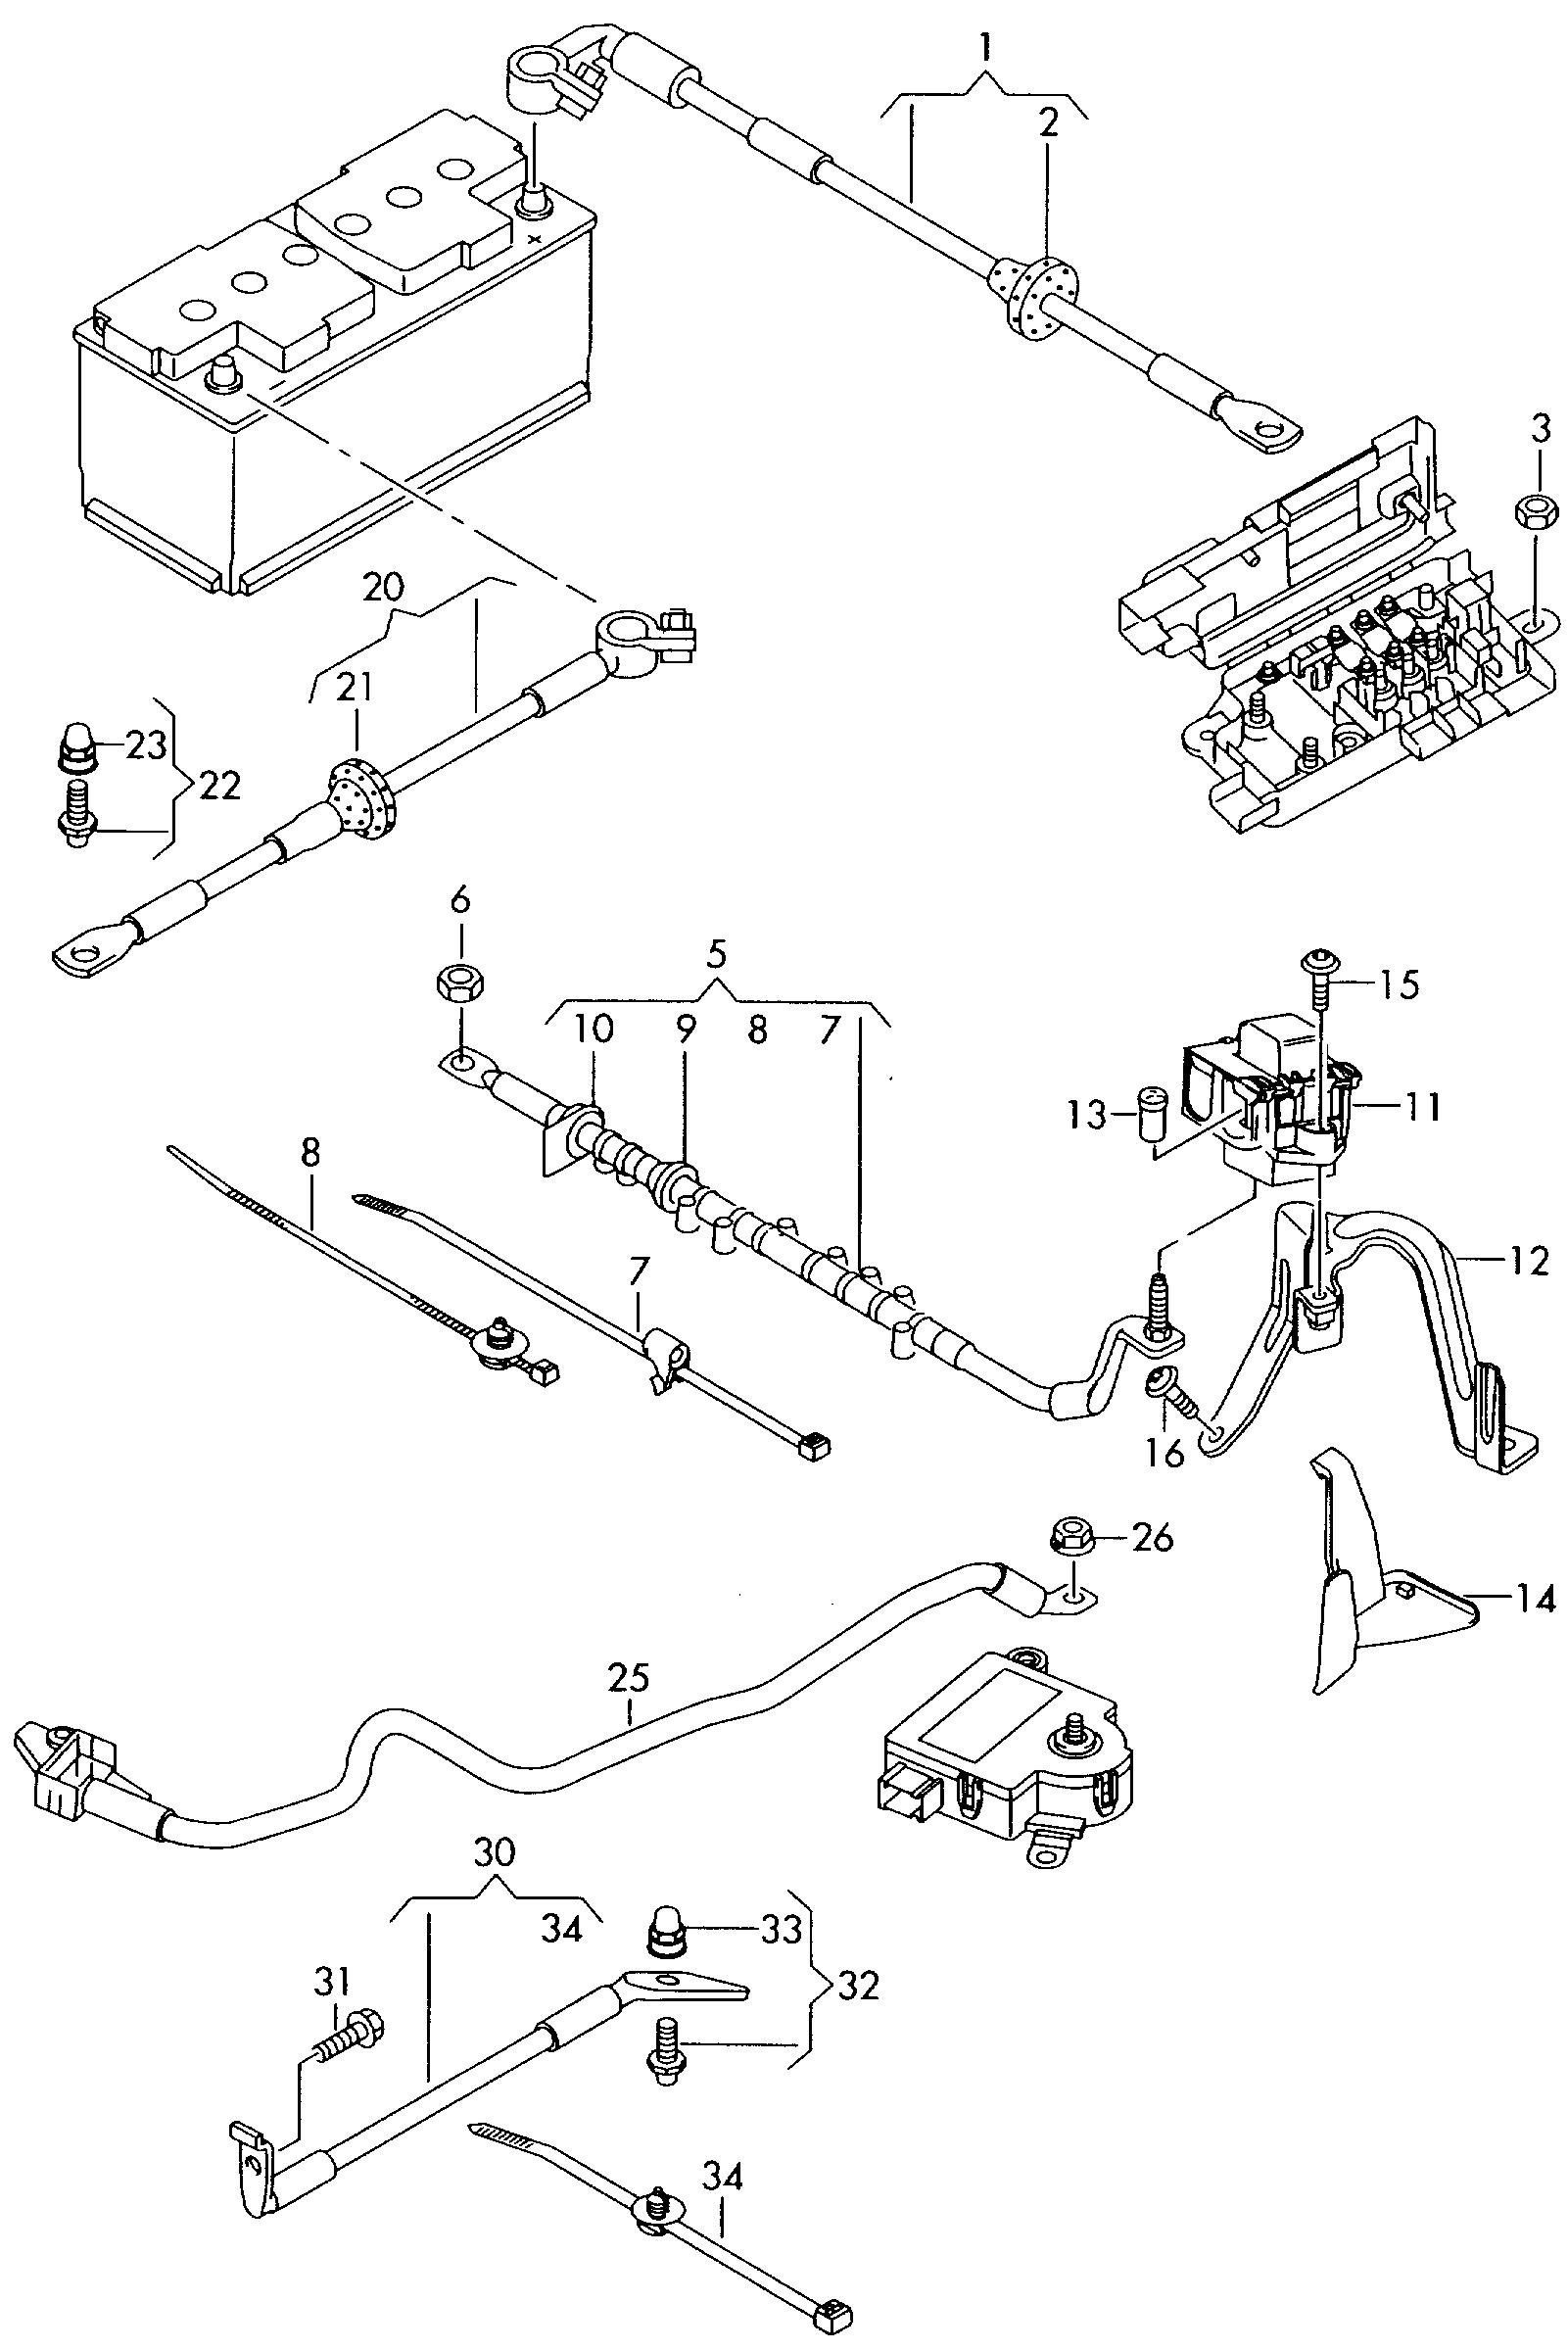 [Download 24+] 2007 Audi Q7 Wiring Diagram